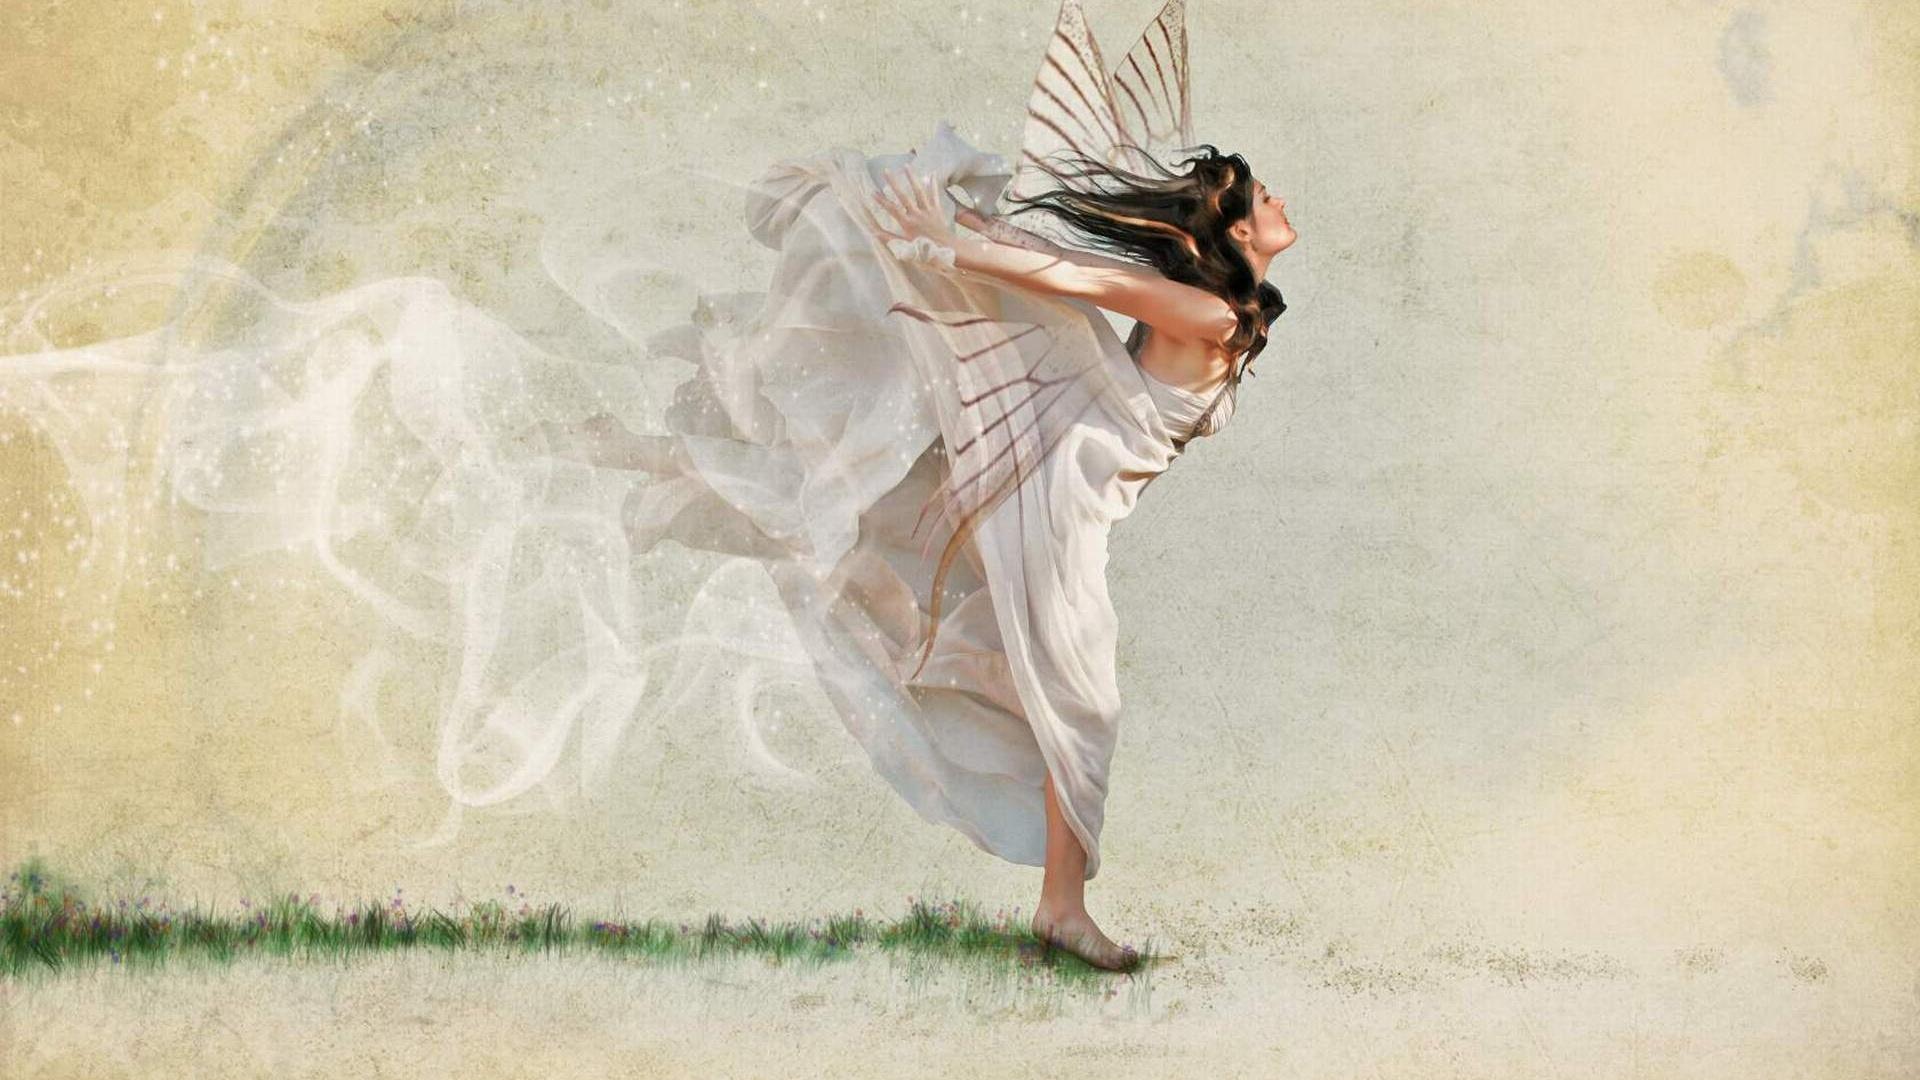 Flying Girl wallpaper photo hd